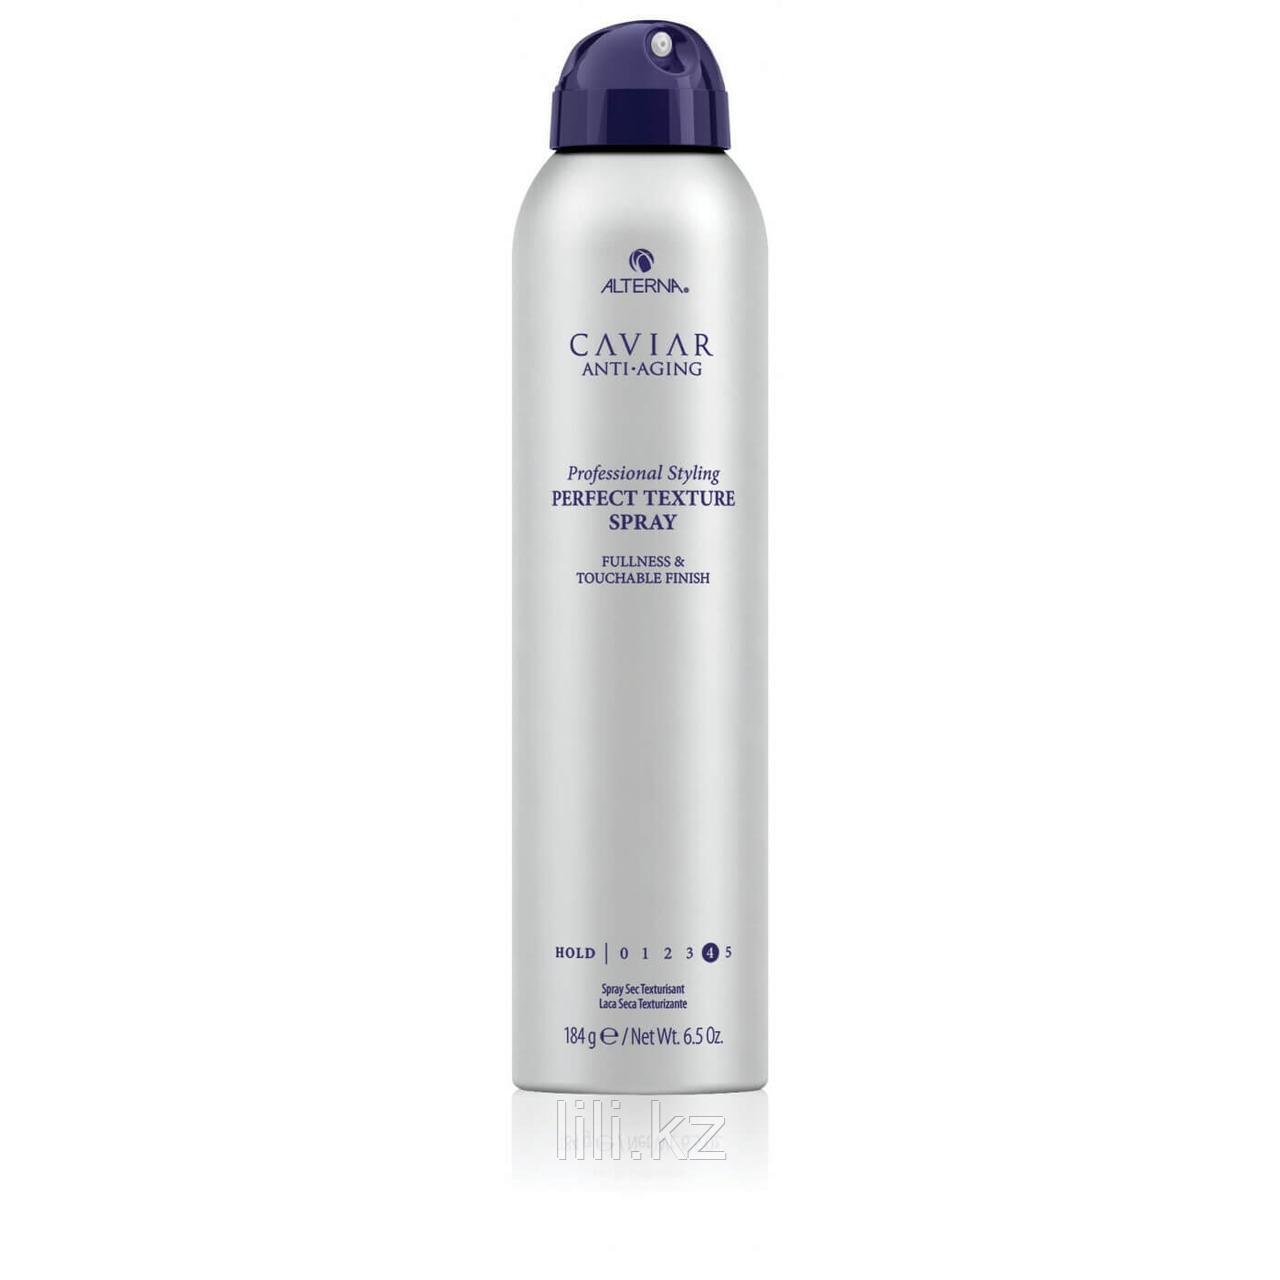 Текстурирующий спрей для волос Alterna Caviar Anti-Aging Perfect Texture Finishing Spray 184 мл.